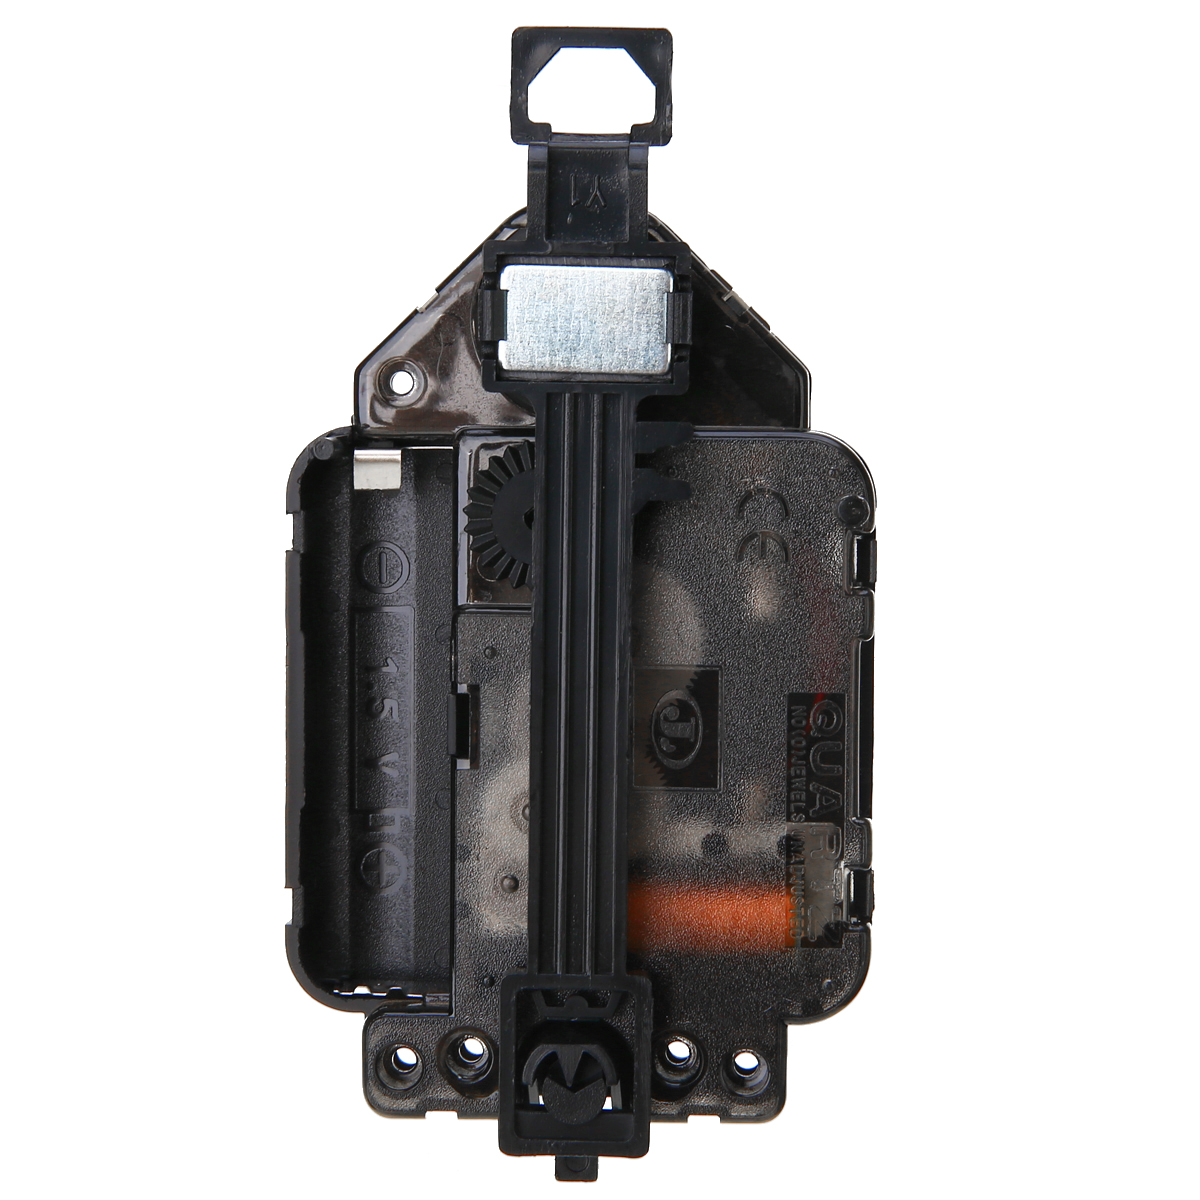 Replacement Quartz alarm clock movement 14mm threadless shaft DIY